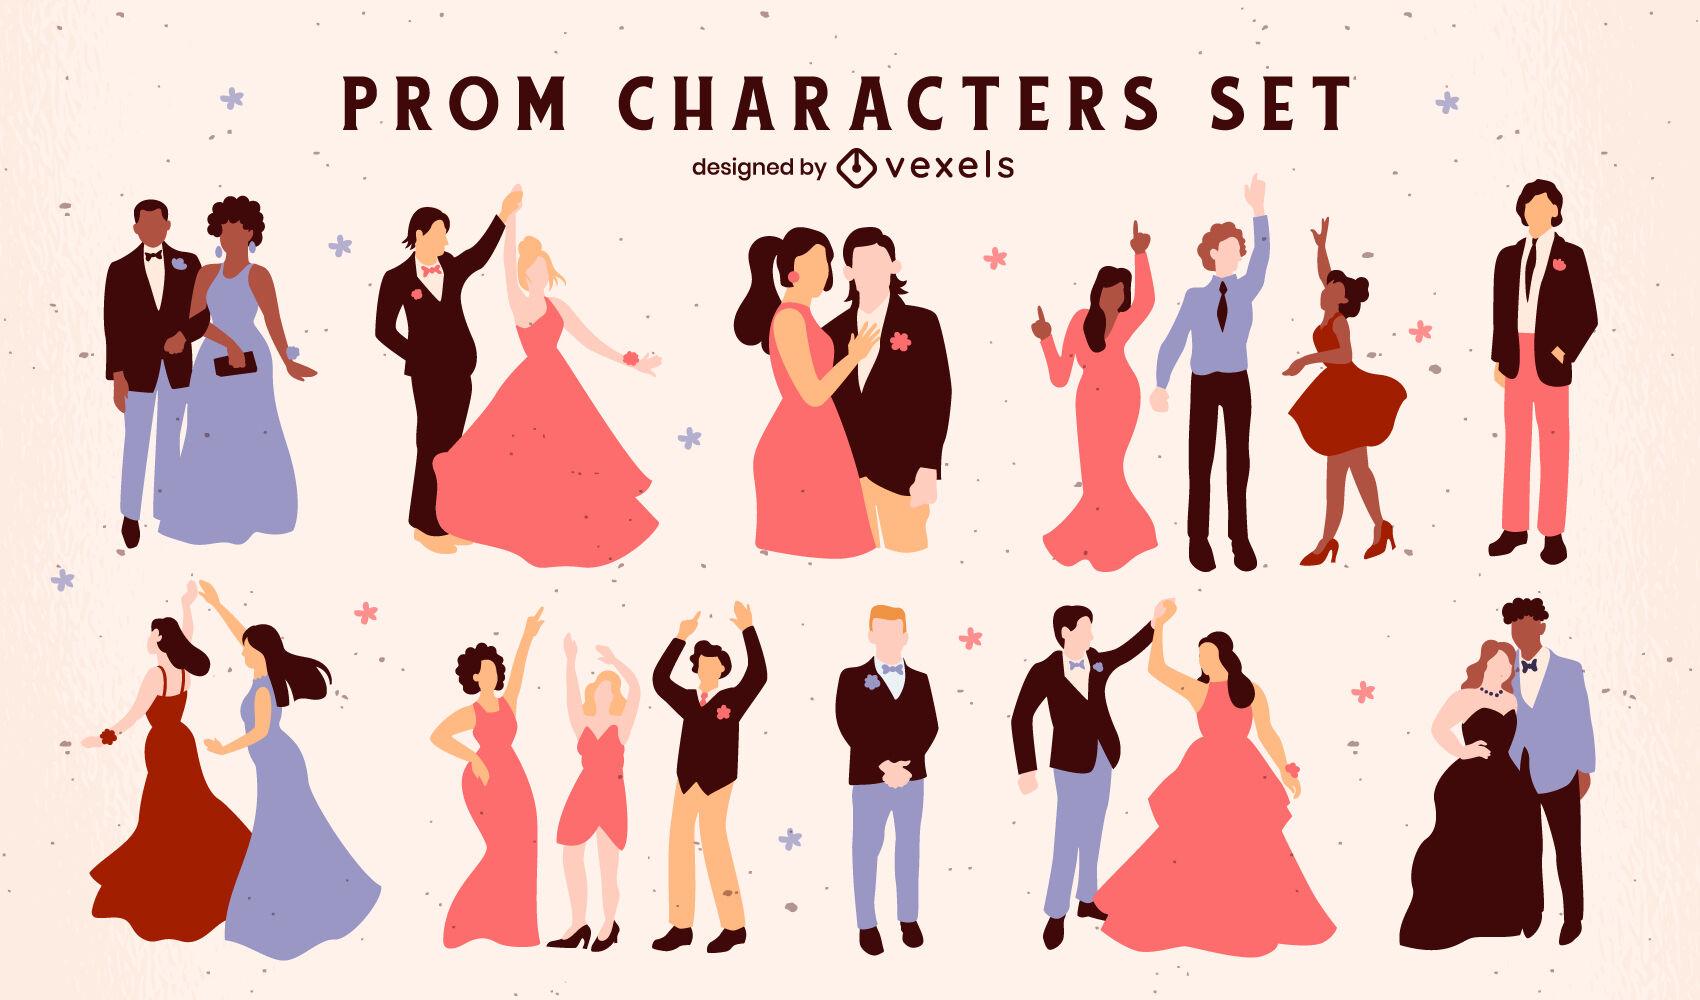 Prom-Party-Charaktere im formellen Kleiderset